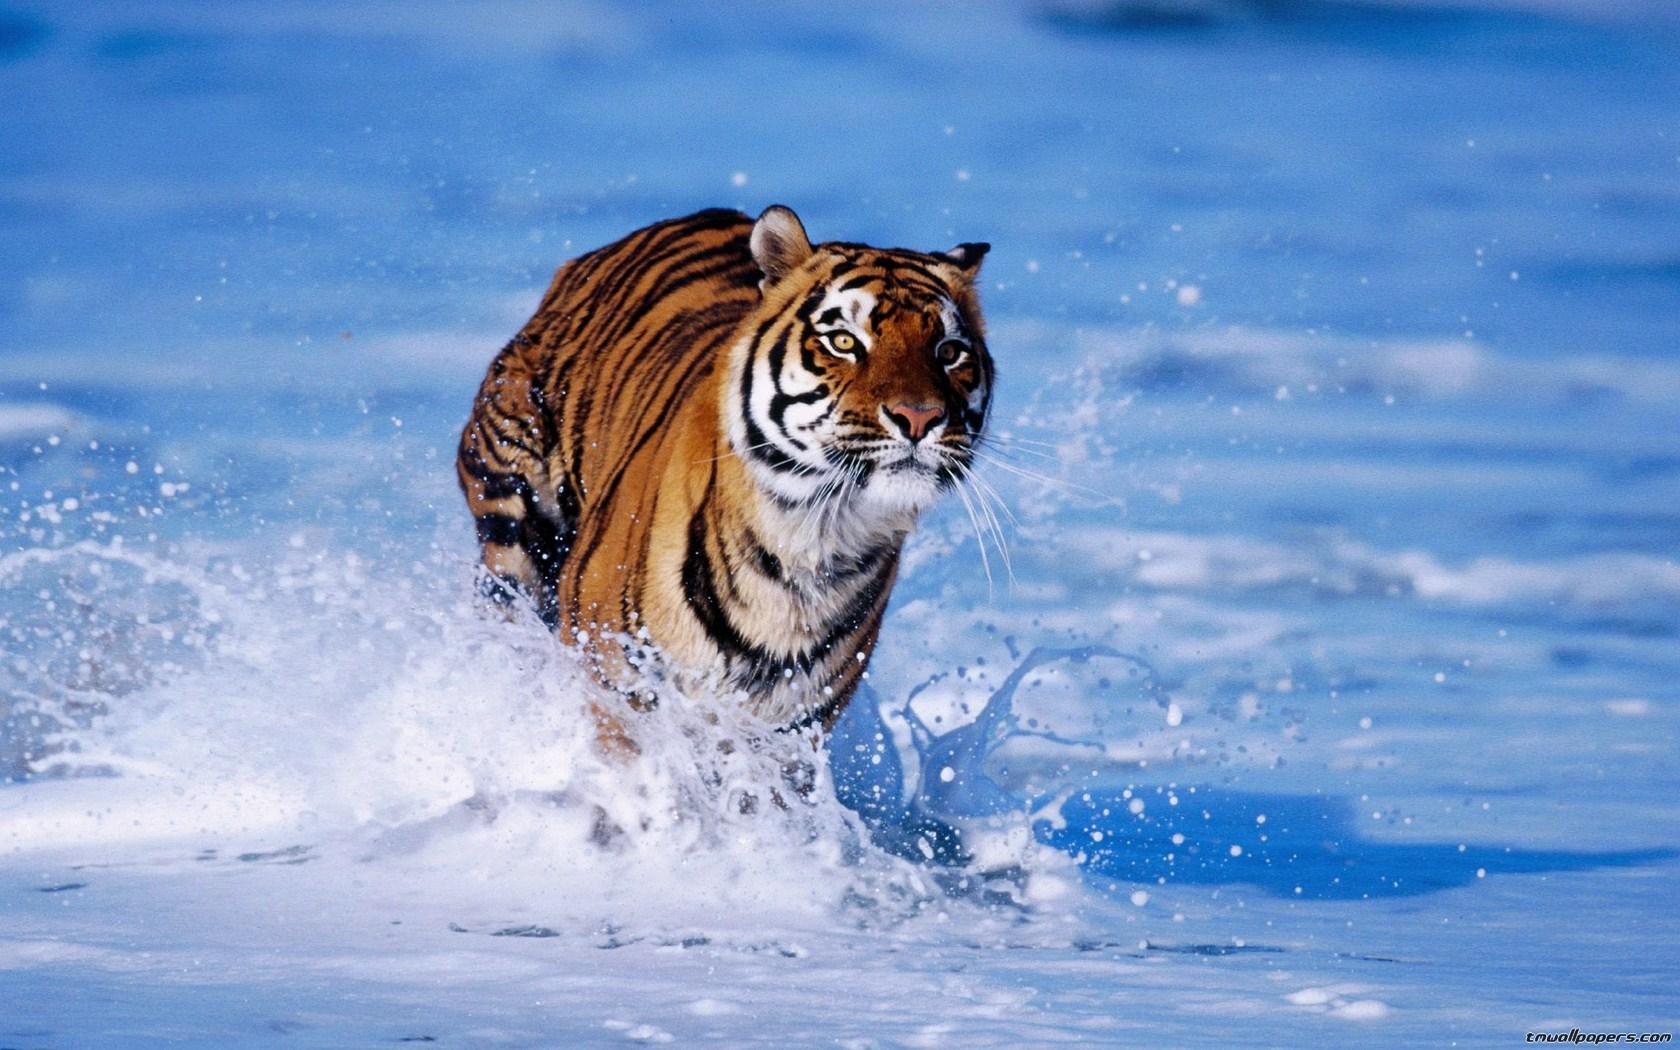 Frasi pensieri e messaggi sugli animali frasi aforismi for Sfondi desktop animali